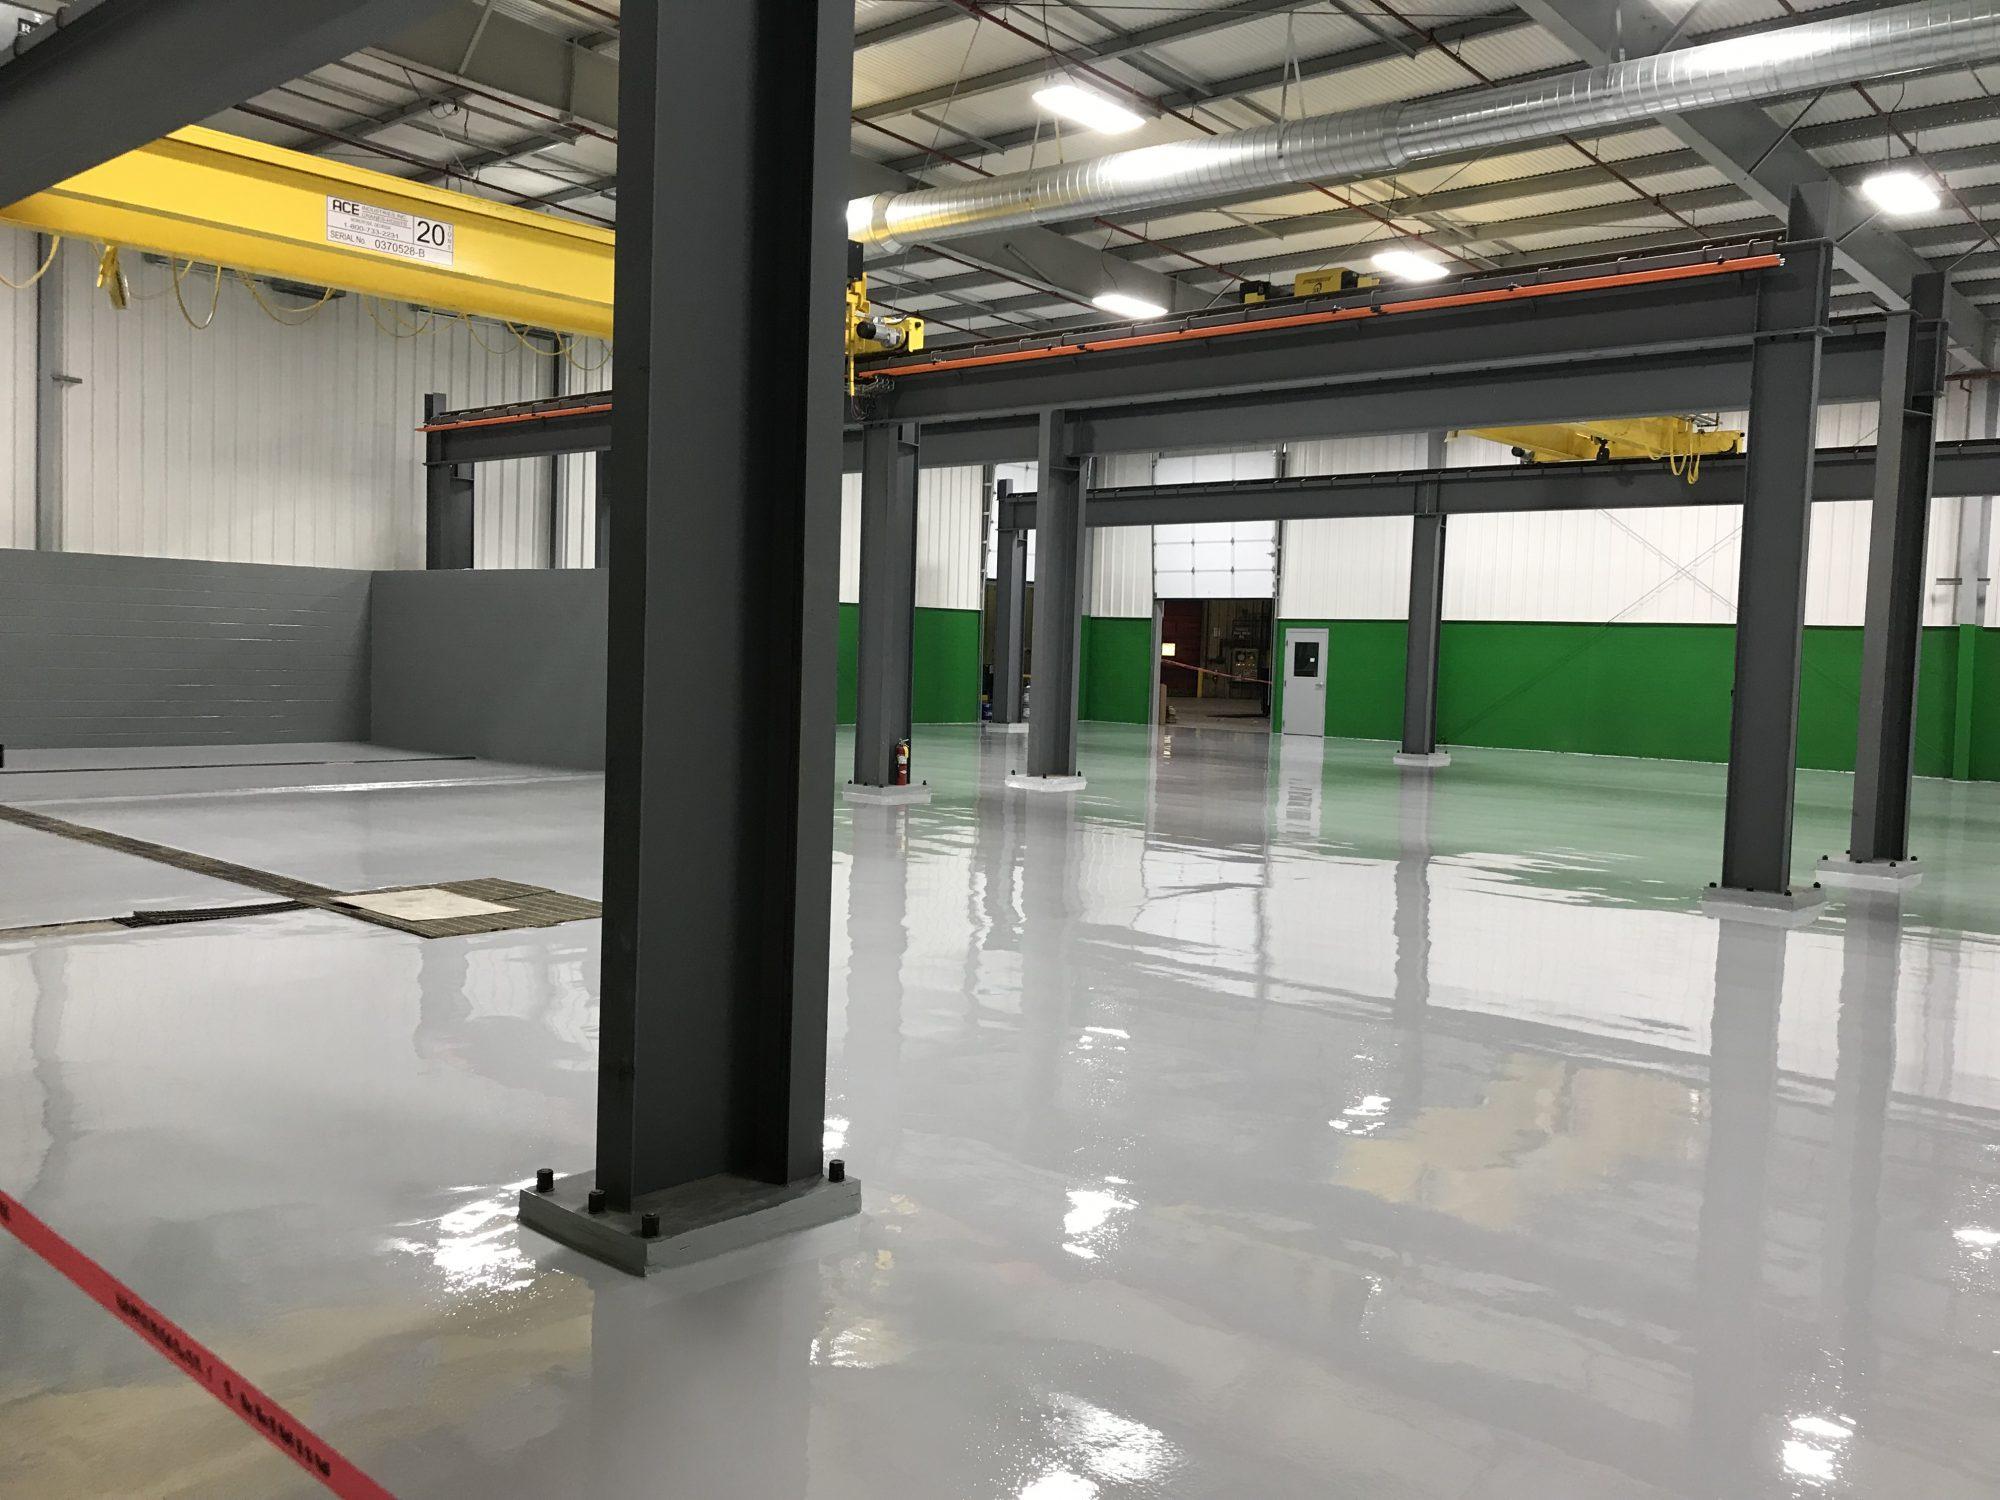 epoxy mortar, concrete floor, resinous coating, urethane topcoat, manufacturing floors, industrial floors